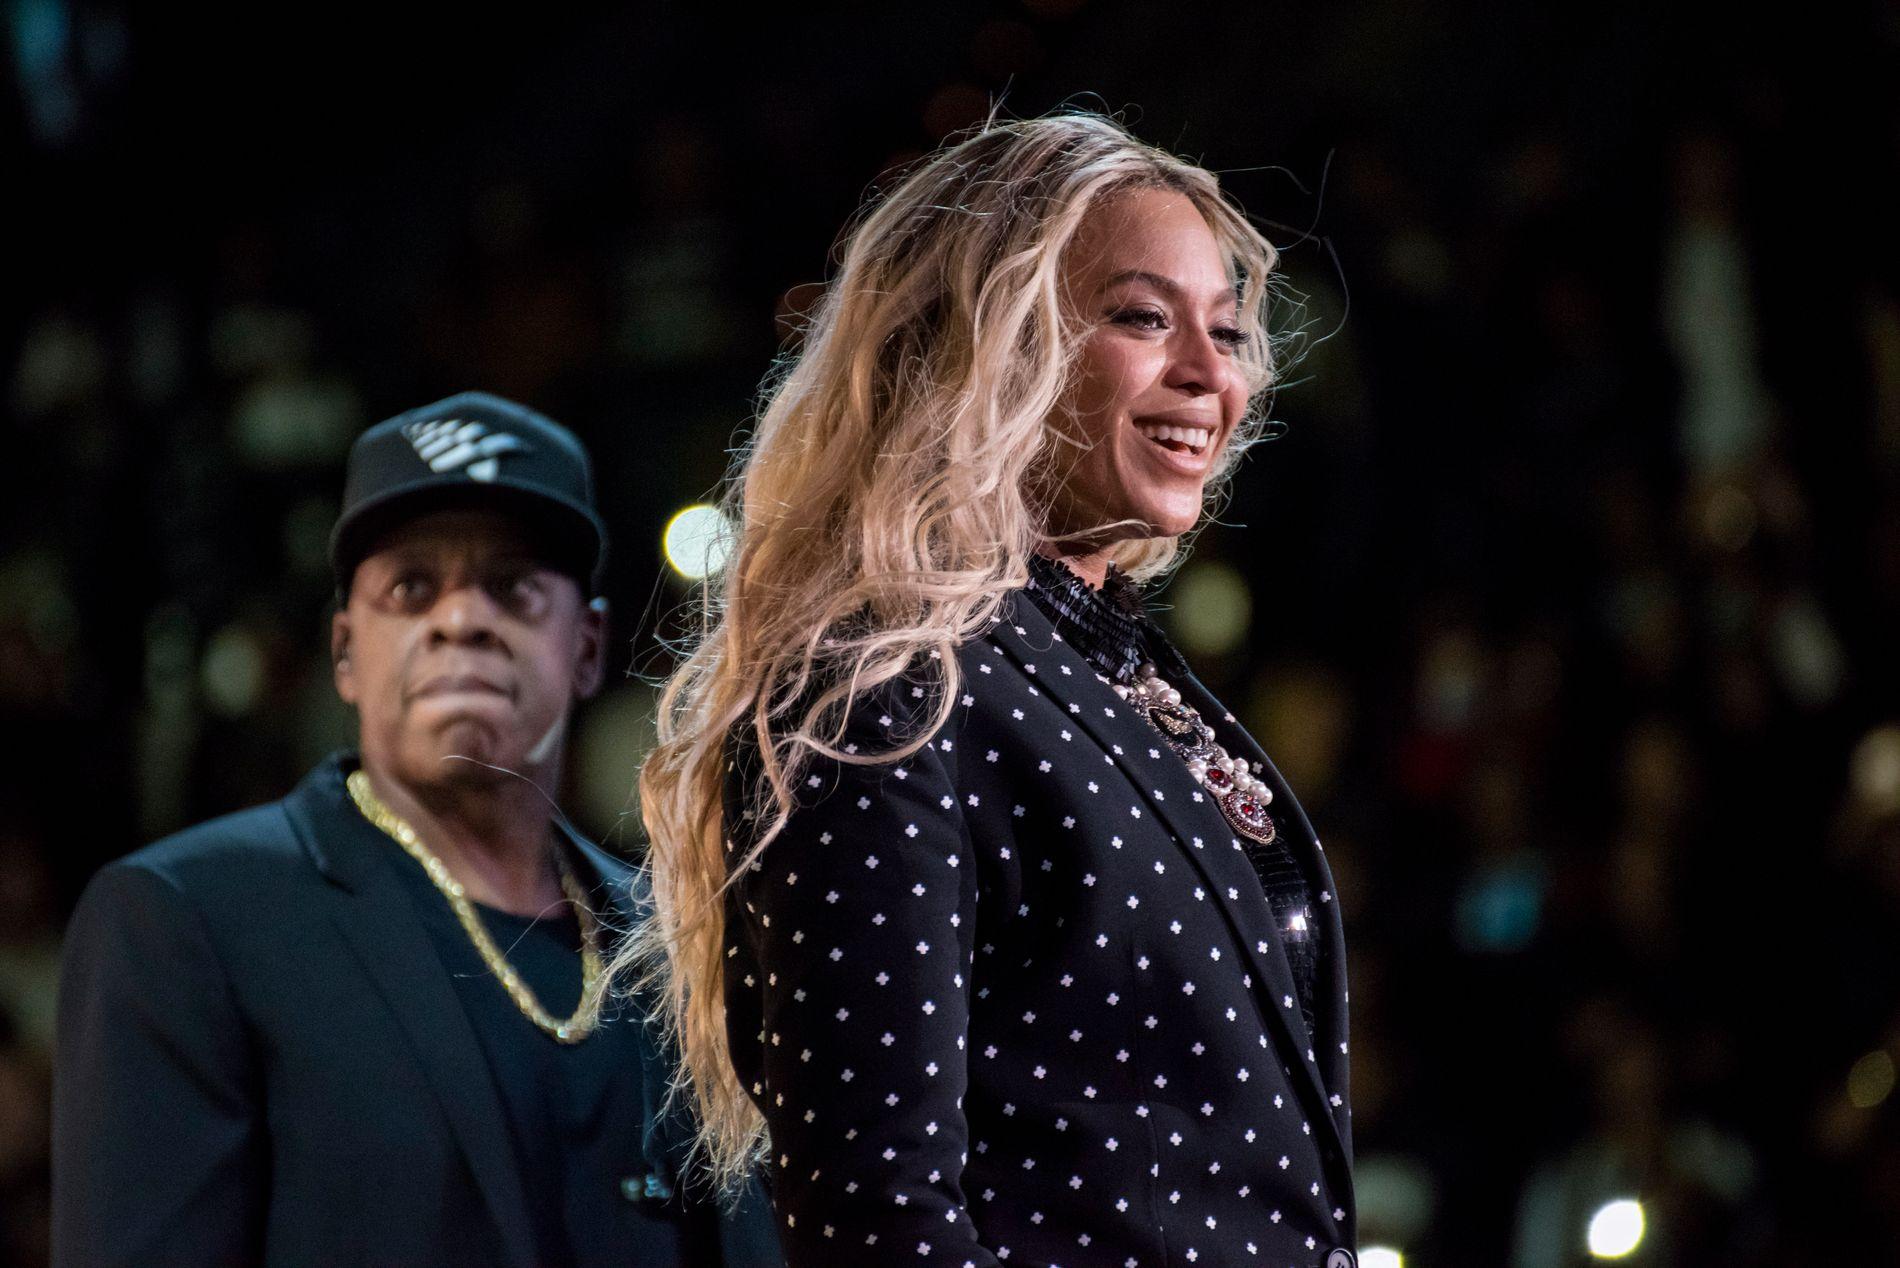 LEDER: Superstjernen Beyoncé lanserte albumet «Lemonade» eksklusivt på Tidal.